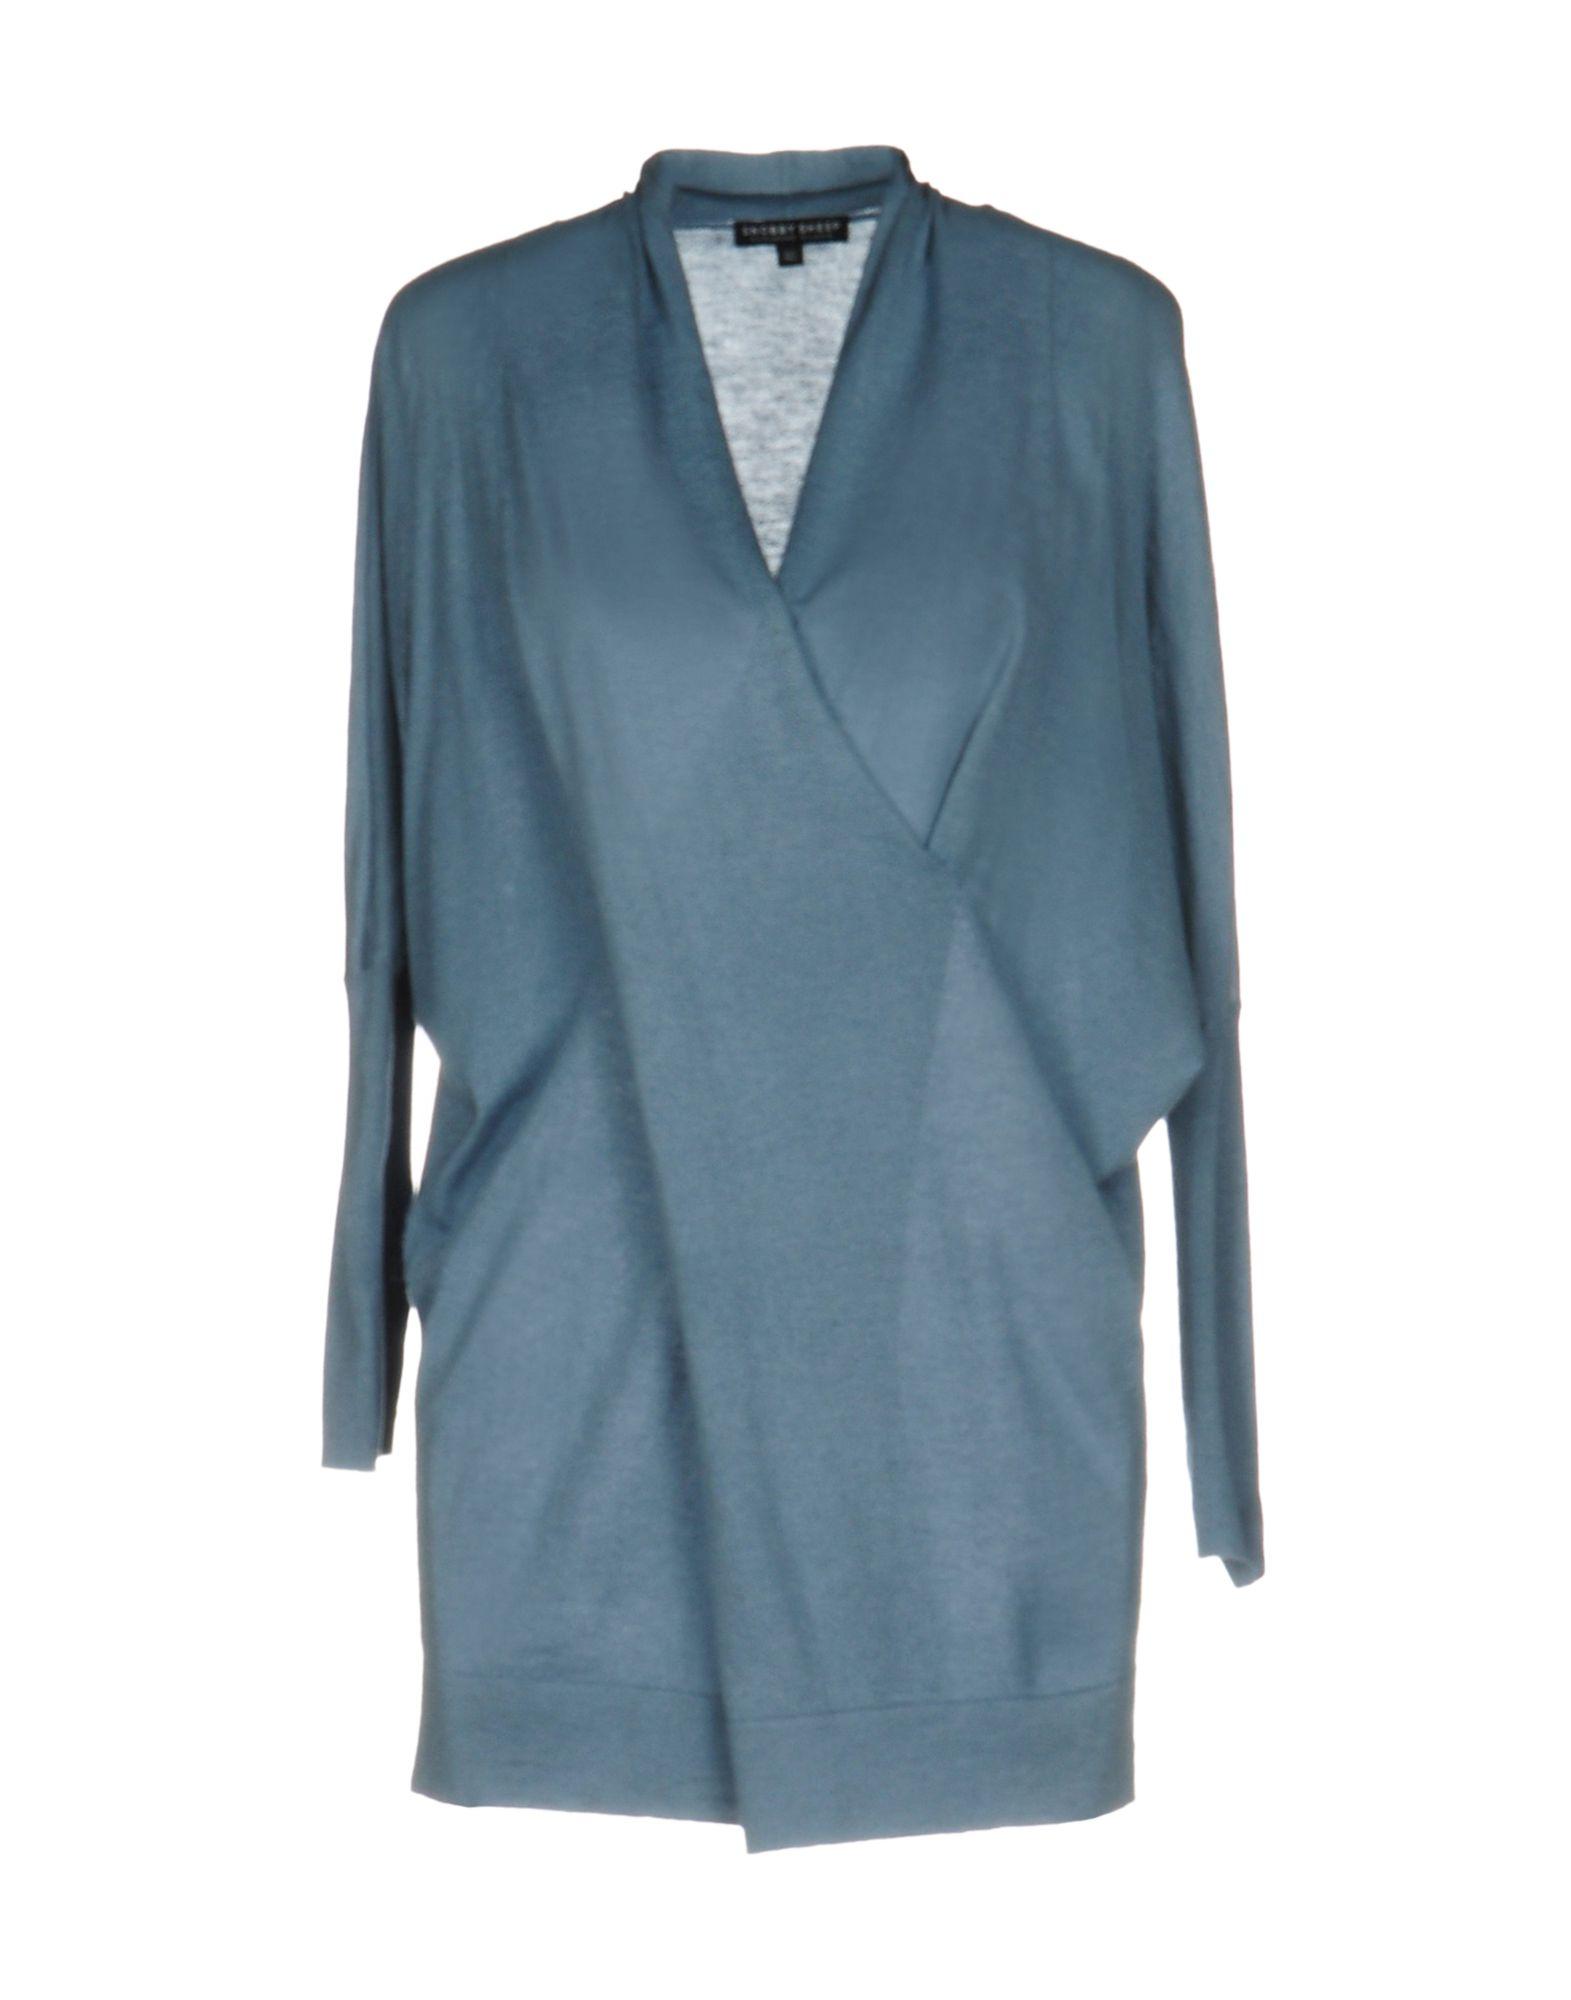 SNOBBY SHEEP Damen Pullover Farbe Taubenblau Größe 3